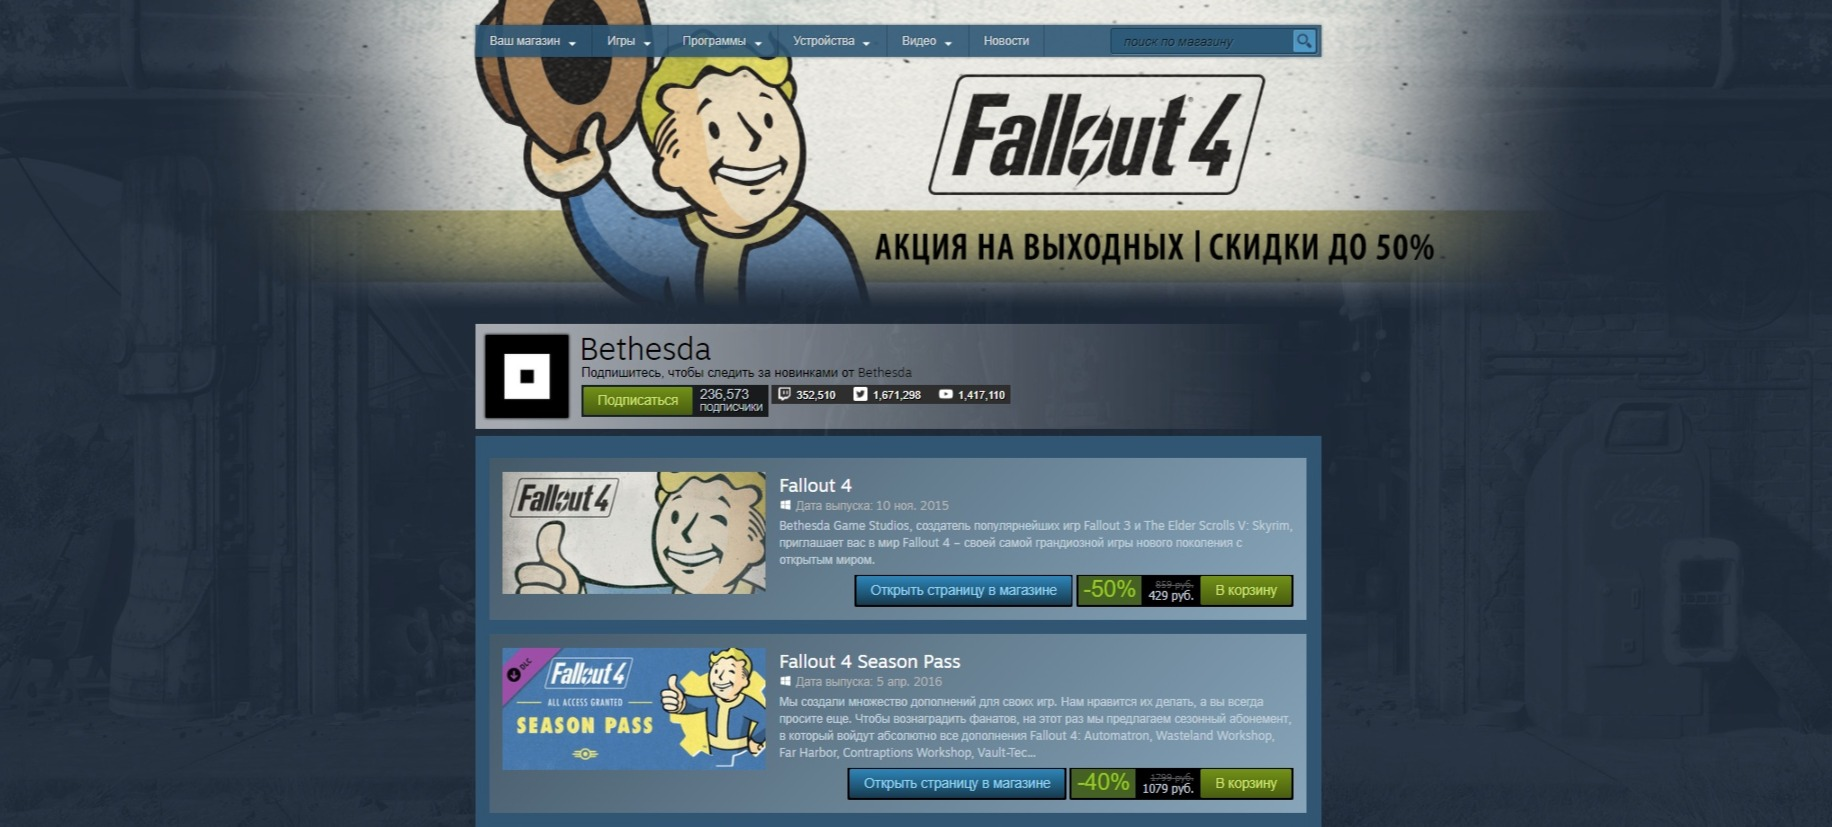 В Steam скидки на серию Fallout